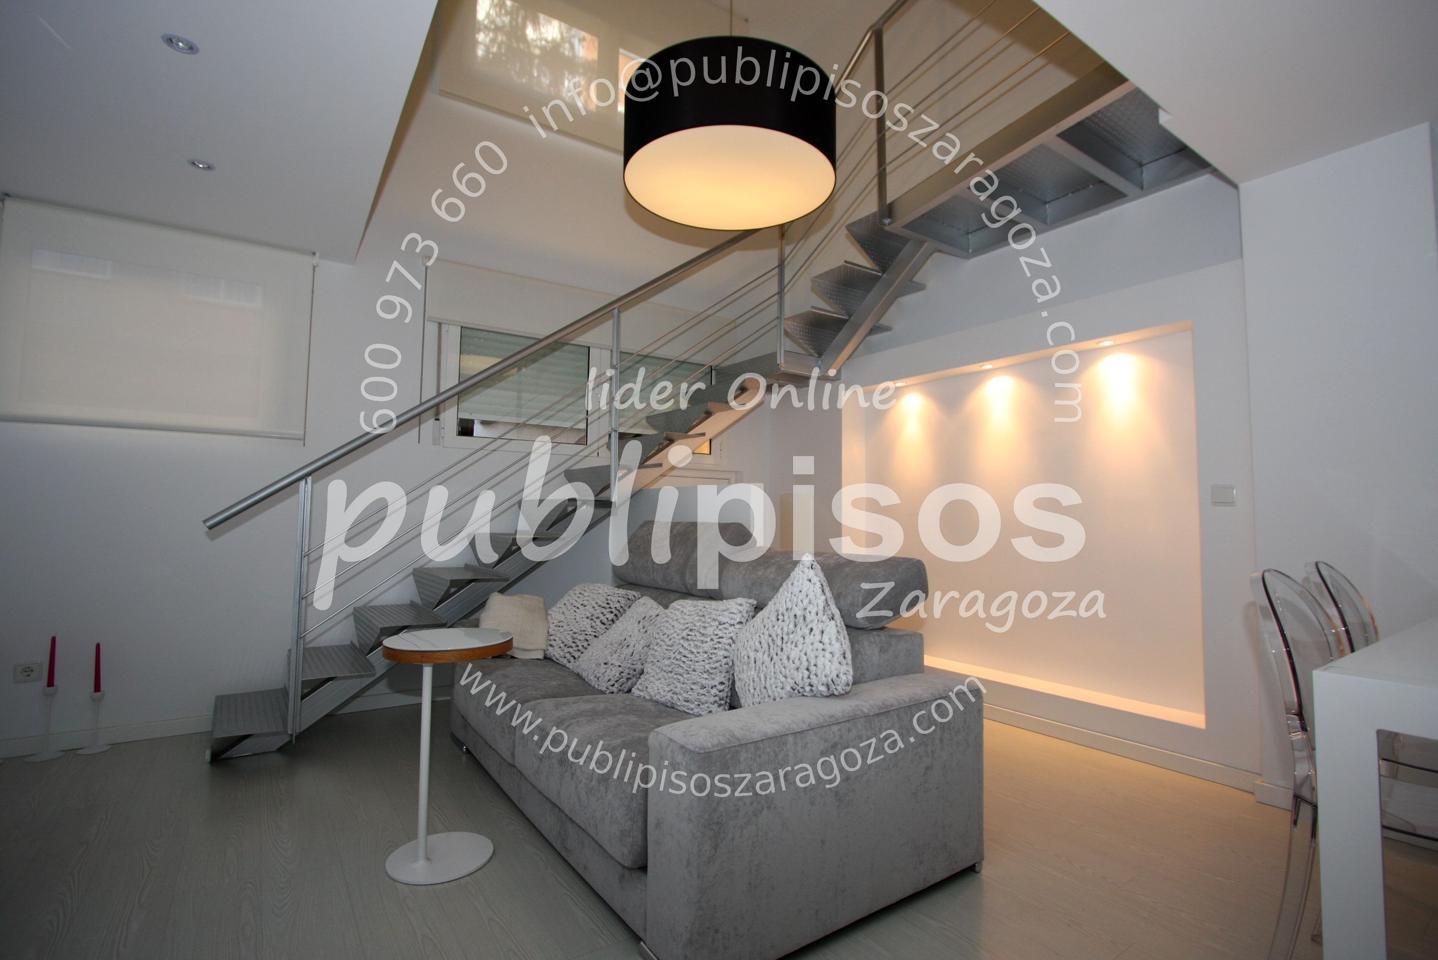 Venta Atico Duplex Obra Nueva Centro Casco Histórico Zaragoza|PUBLIPISOS Inmobiliarias-30